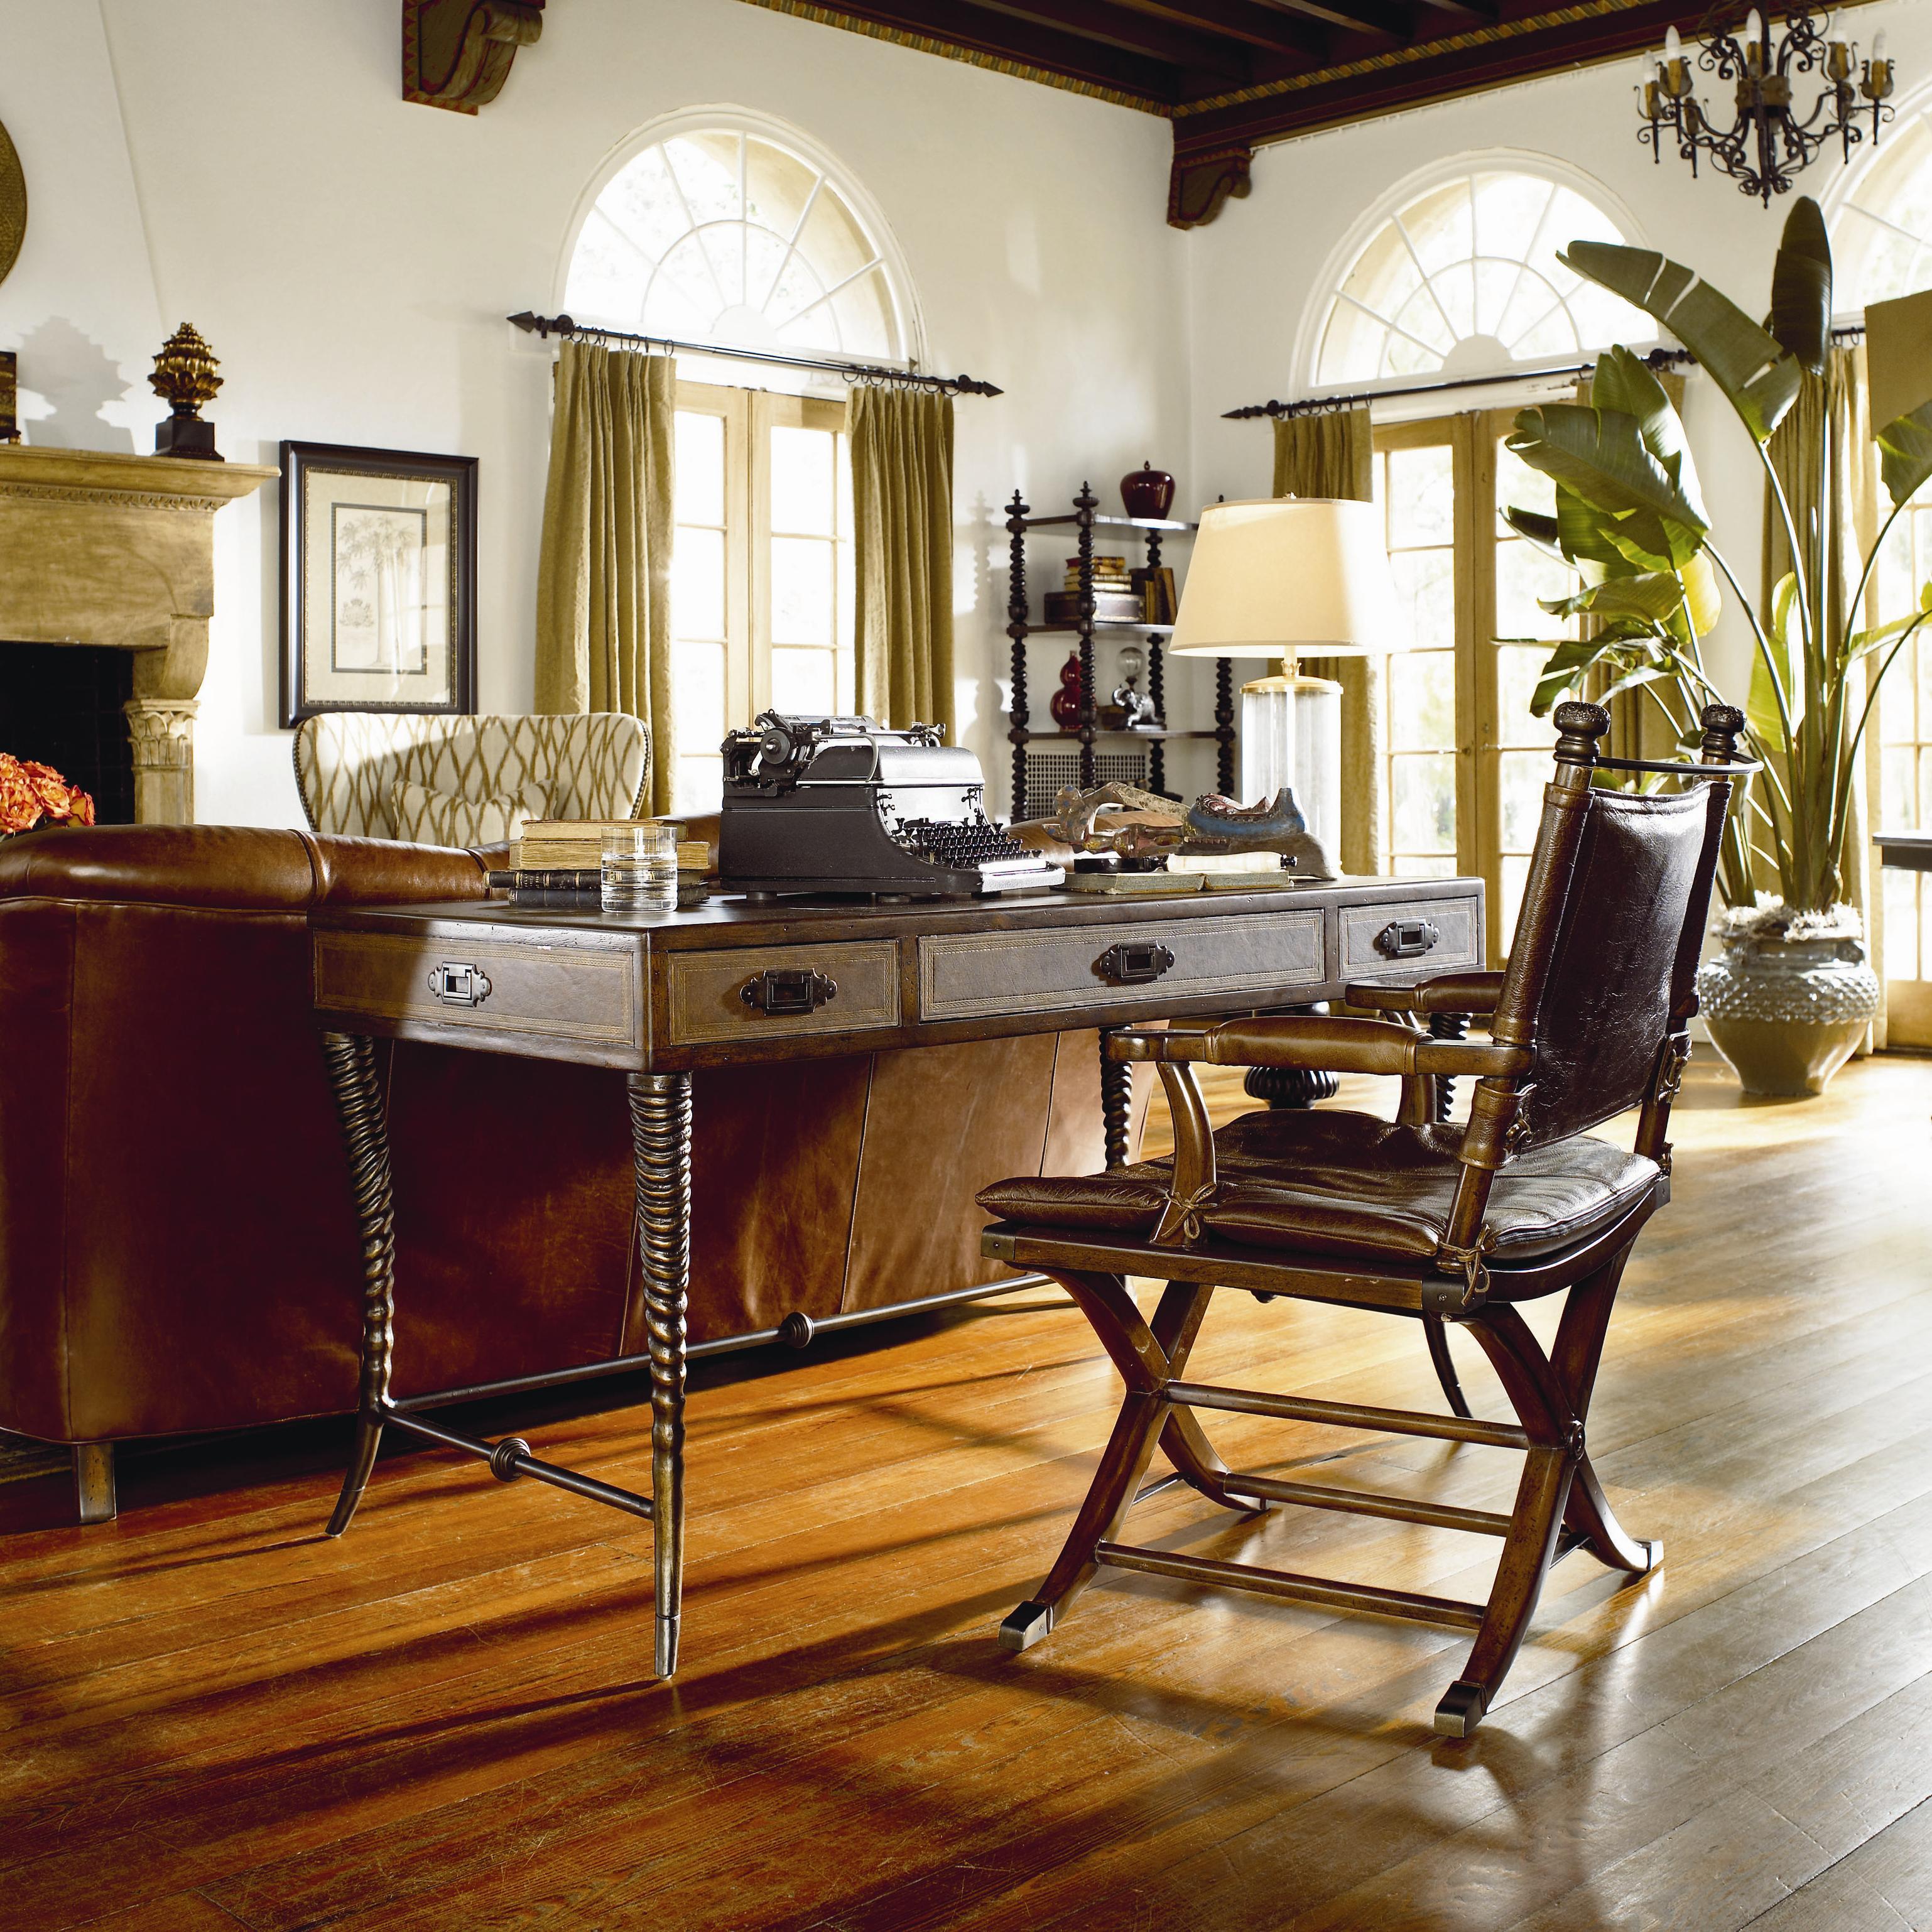 Thomasville 174 Ernest Hemingway 46291 620 Safari Writing